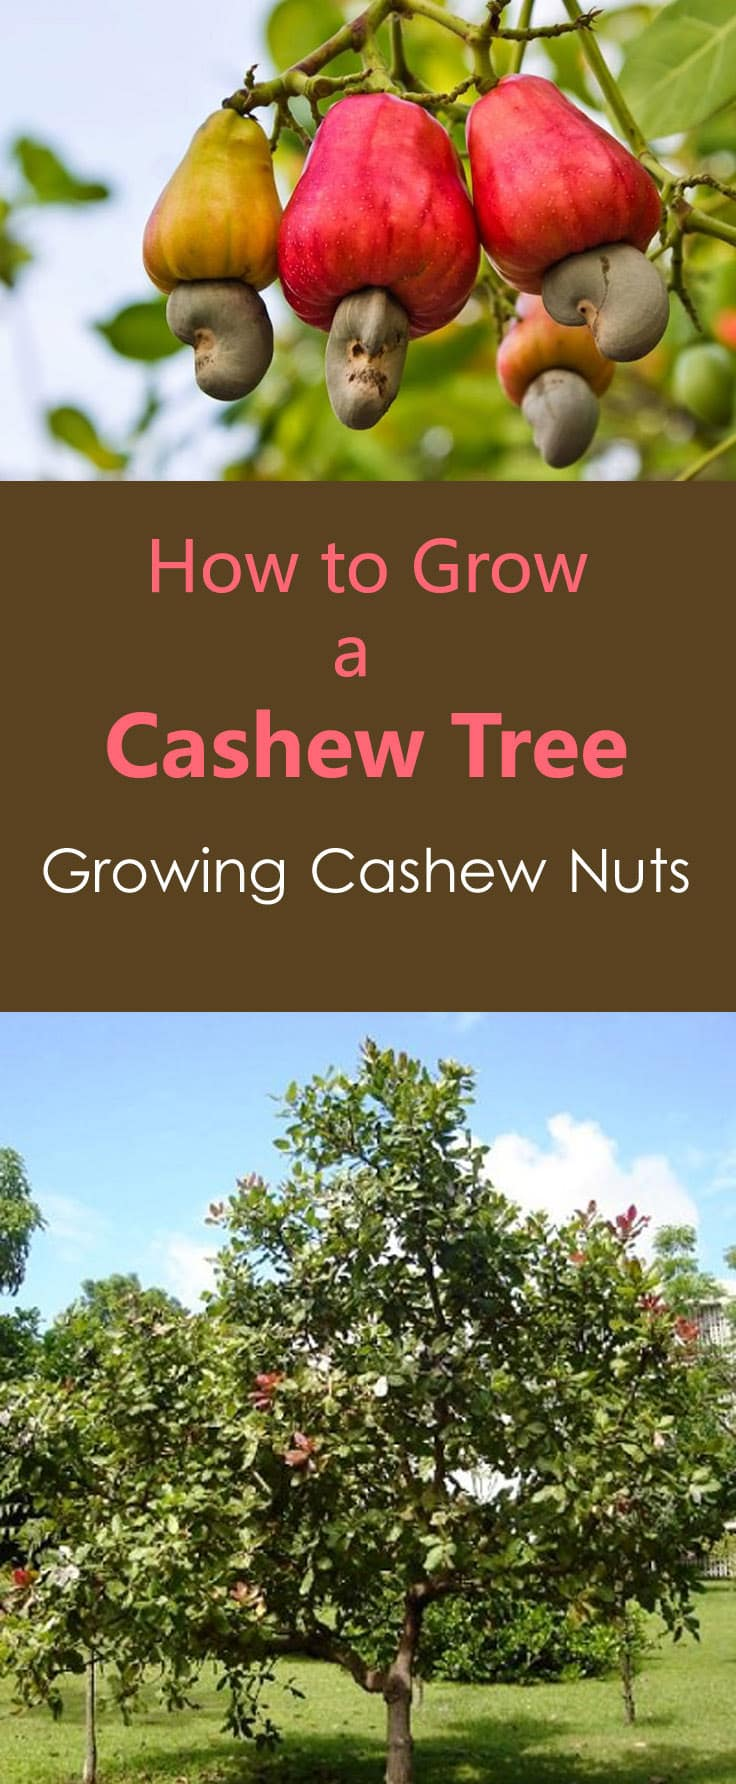 How To Grow A Cashew Tree Growing Cashew Nuts